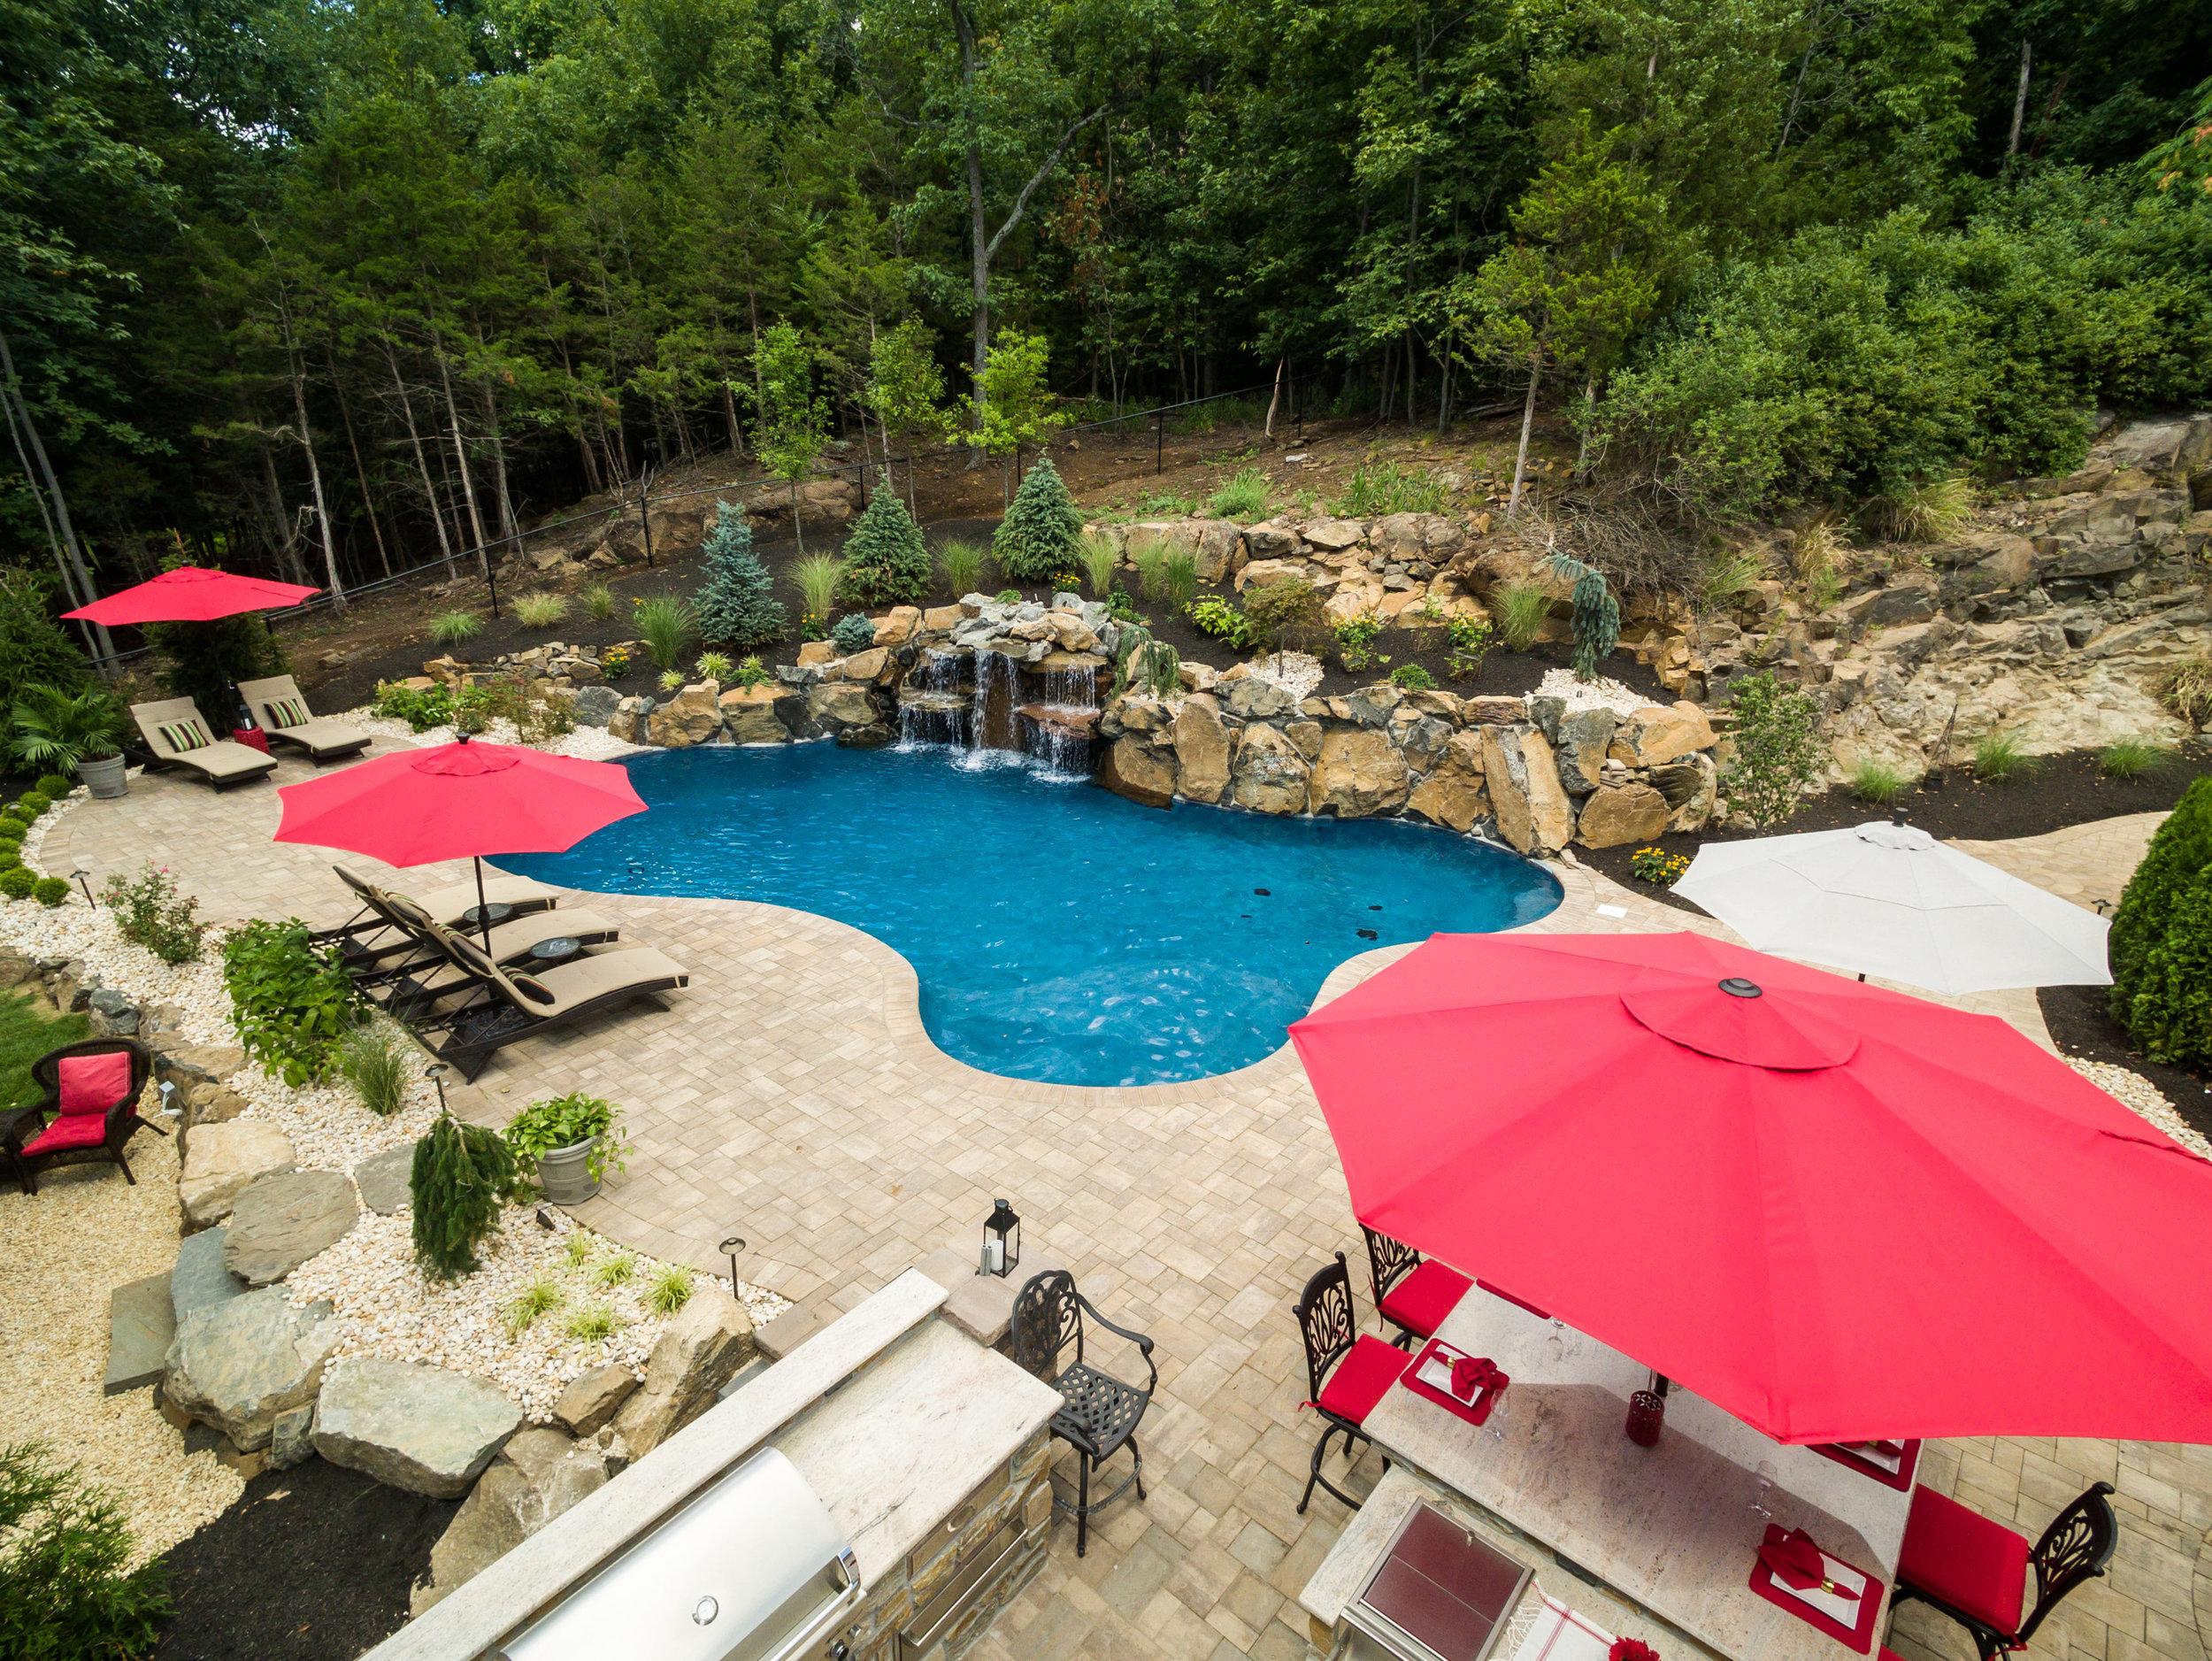 Pool Designs And Landscaping   Wayne Nj Custom Pool Design And Landscape Design K C Land